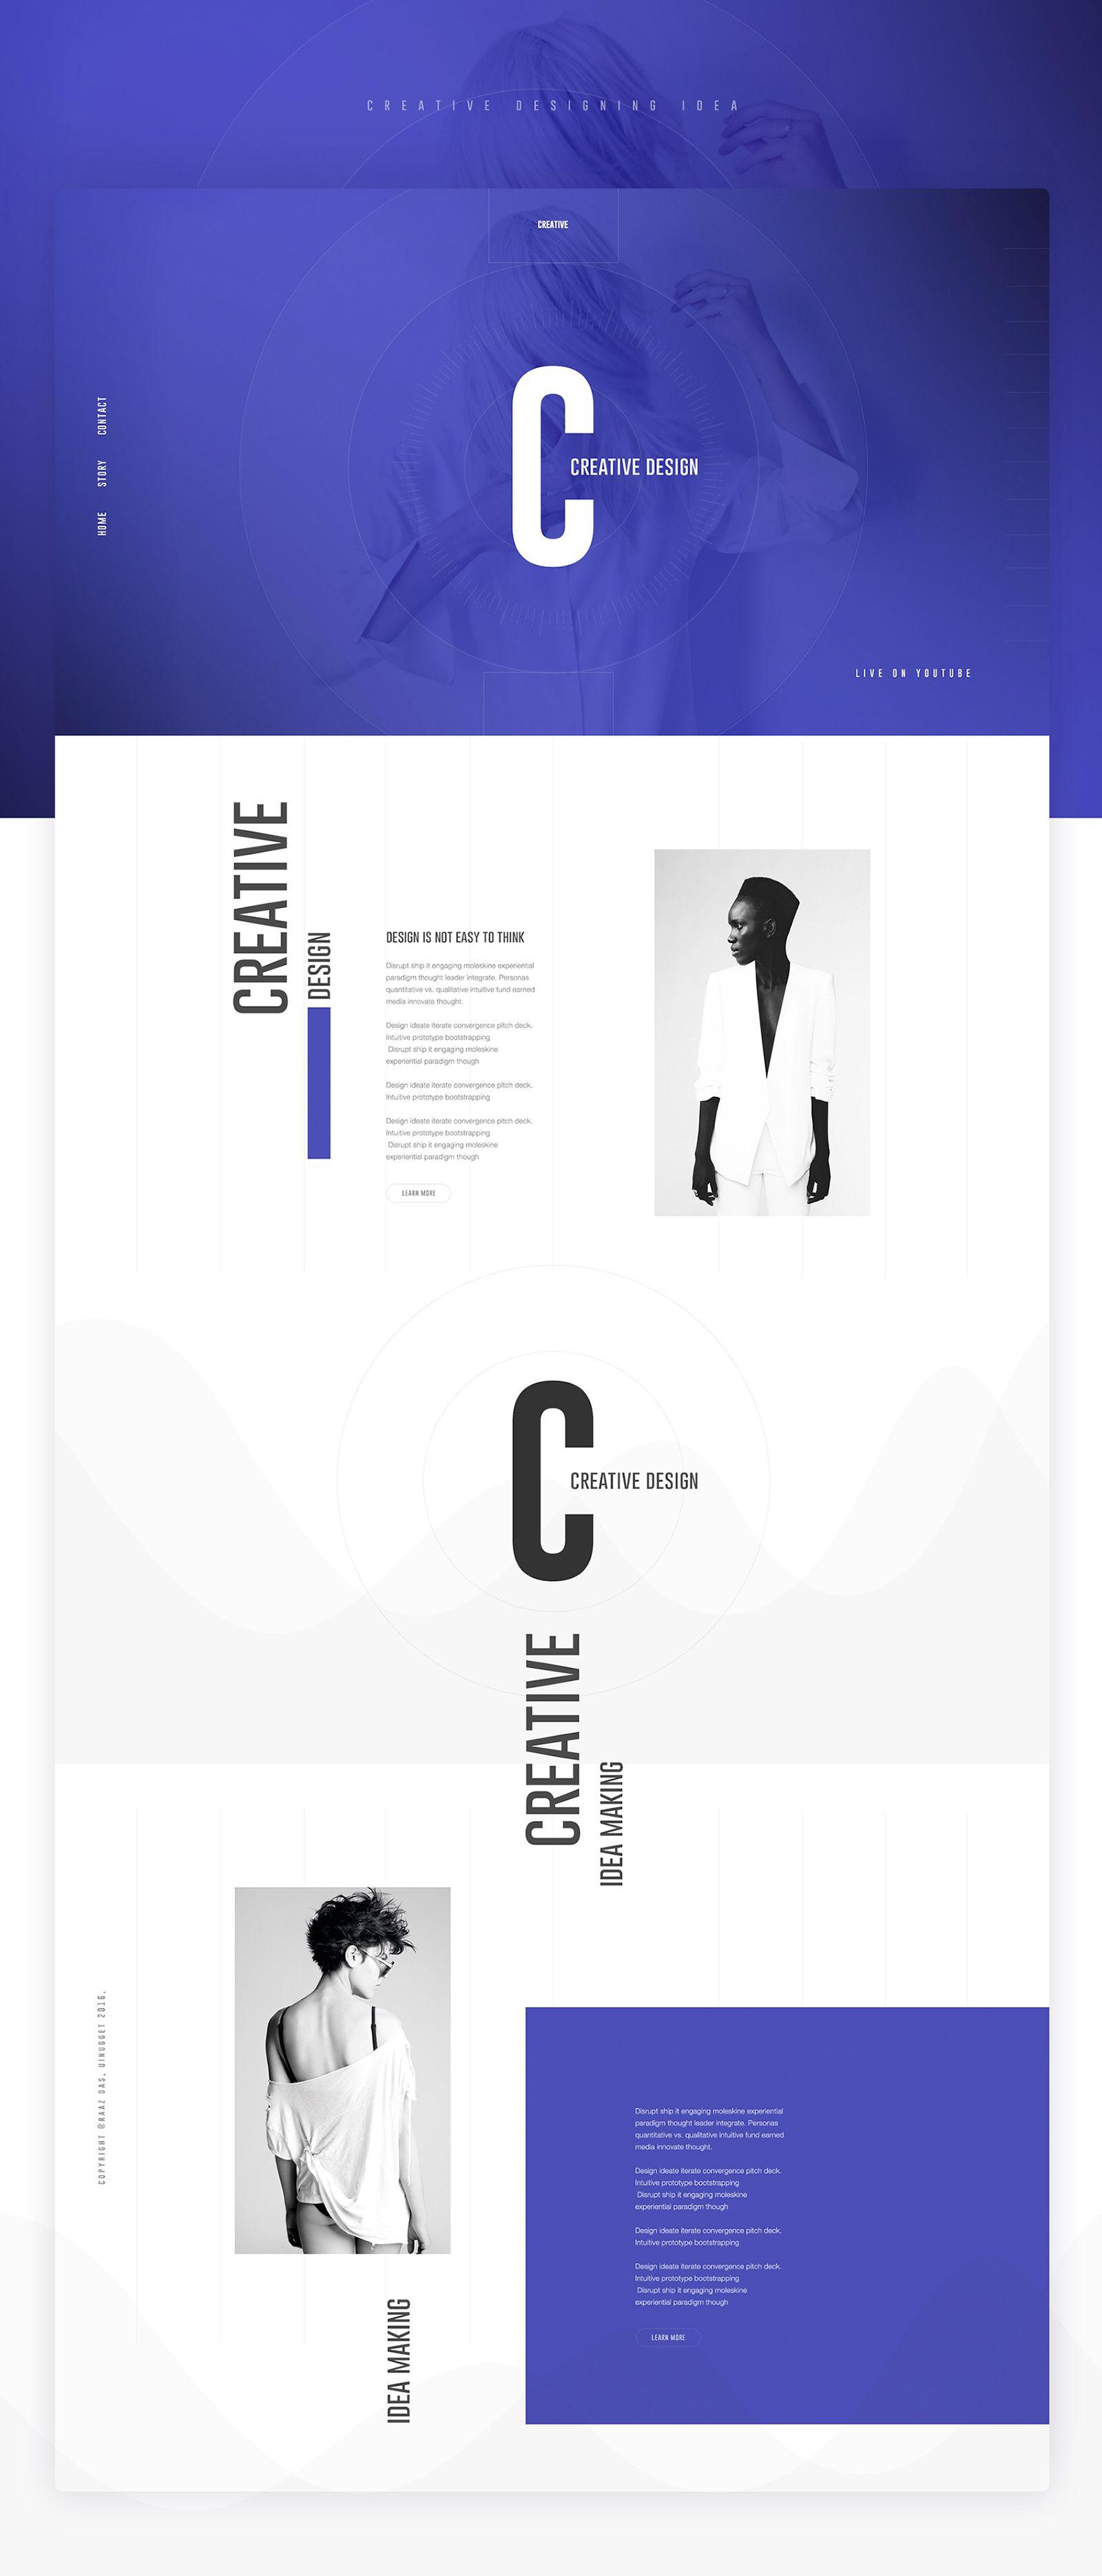 Creative design u ui design concept landing page by razz das